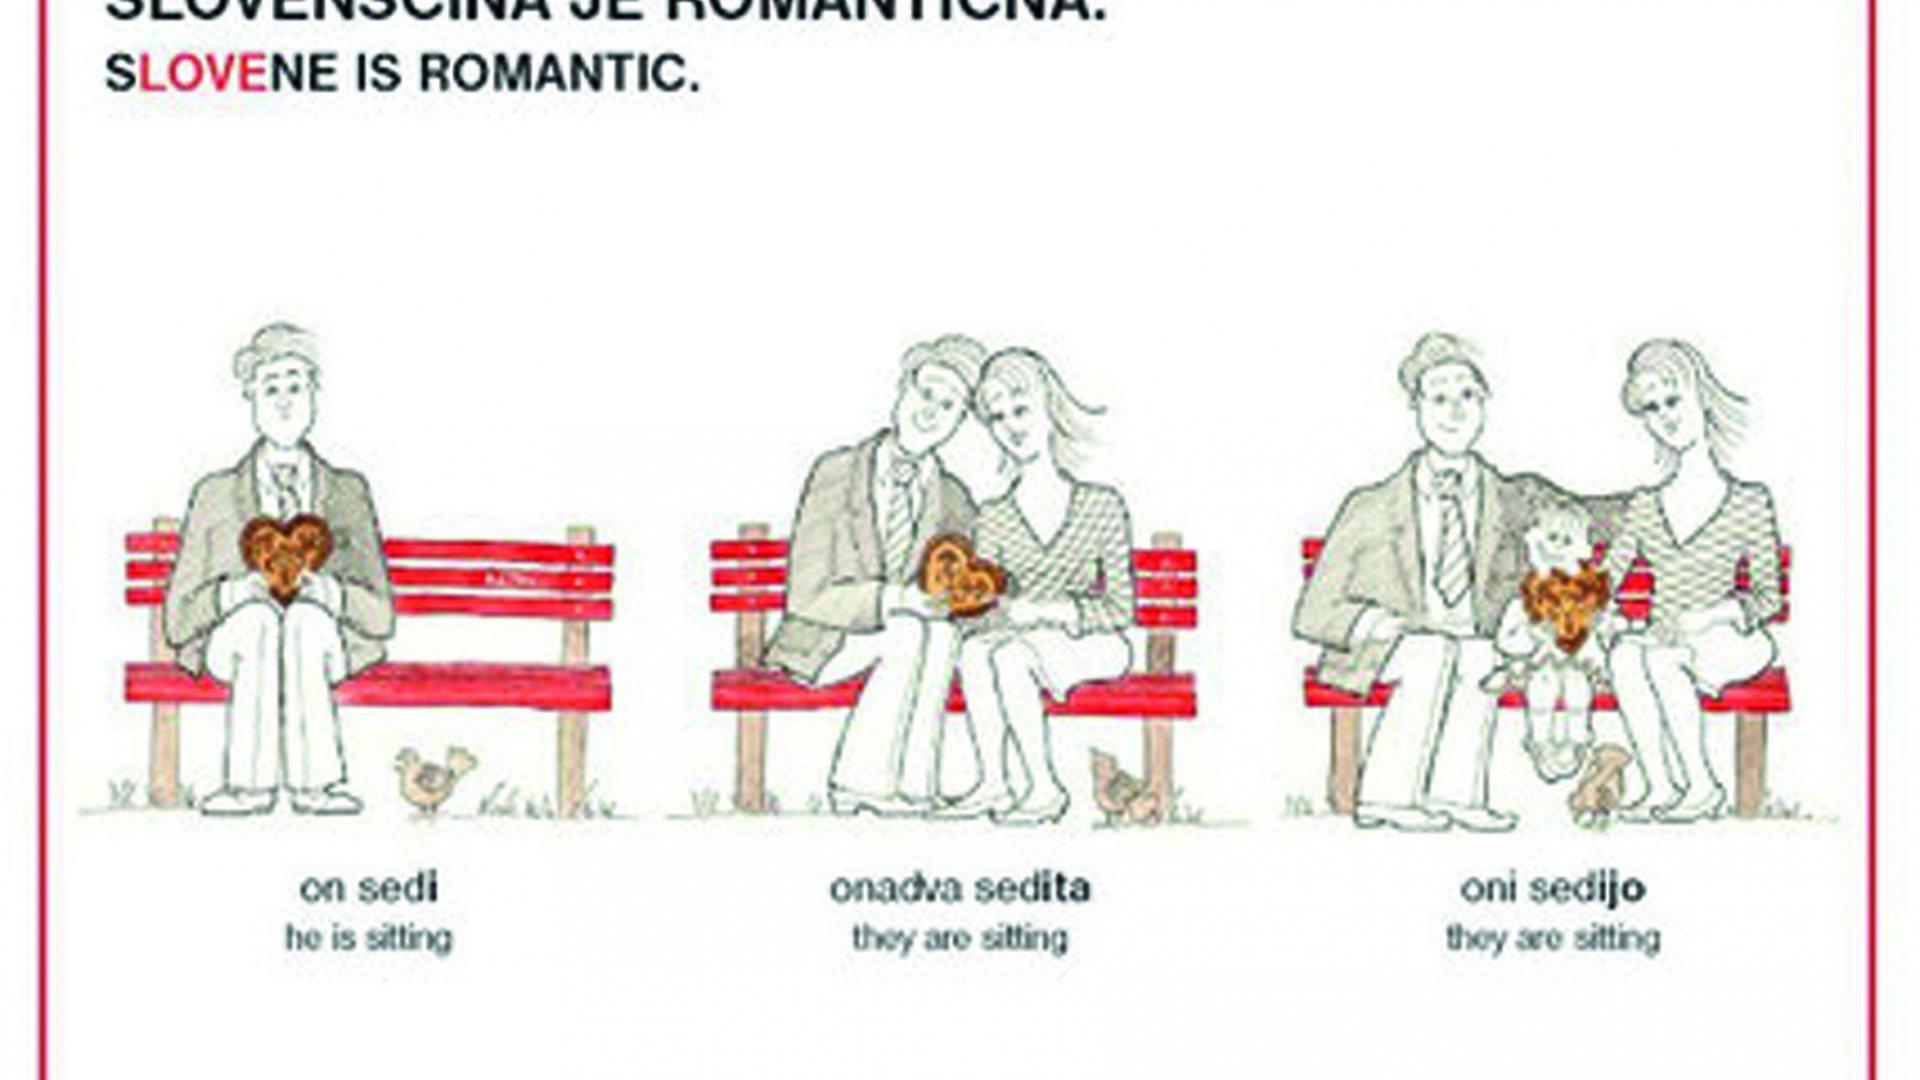 Konverzacija v slovenskem jeziku